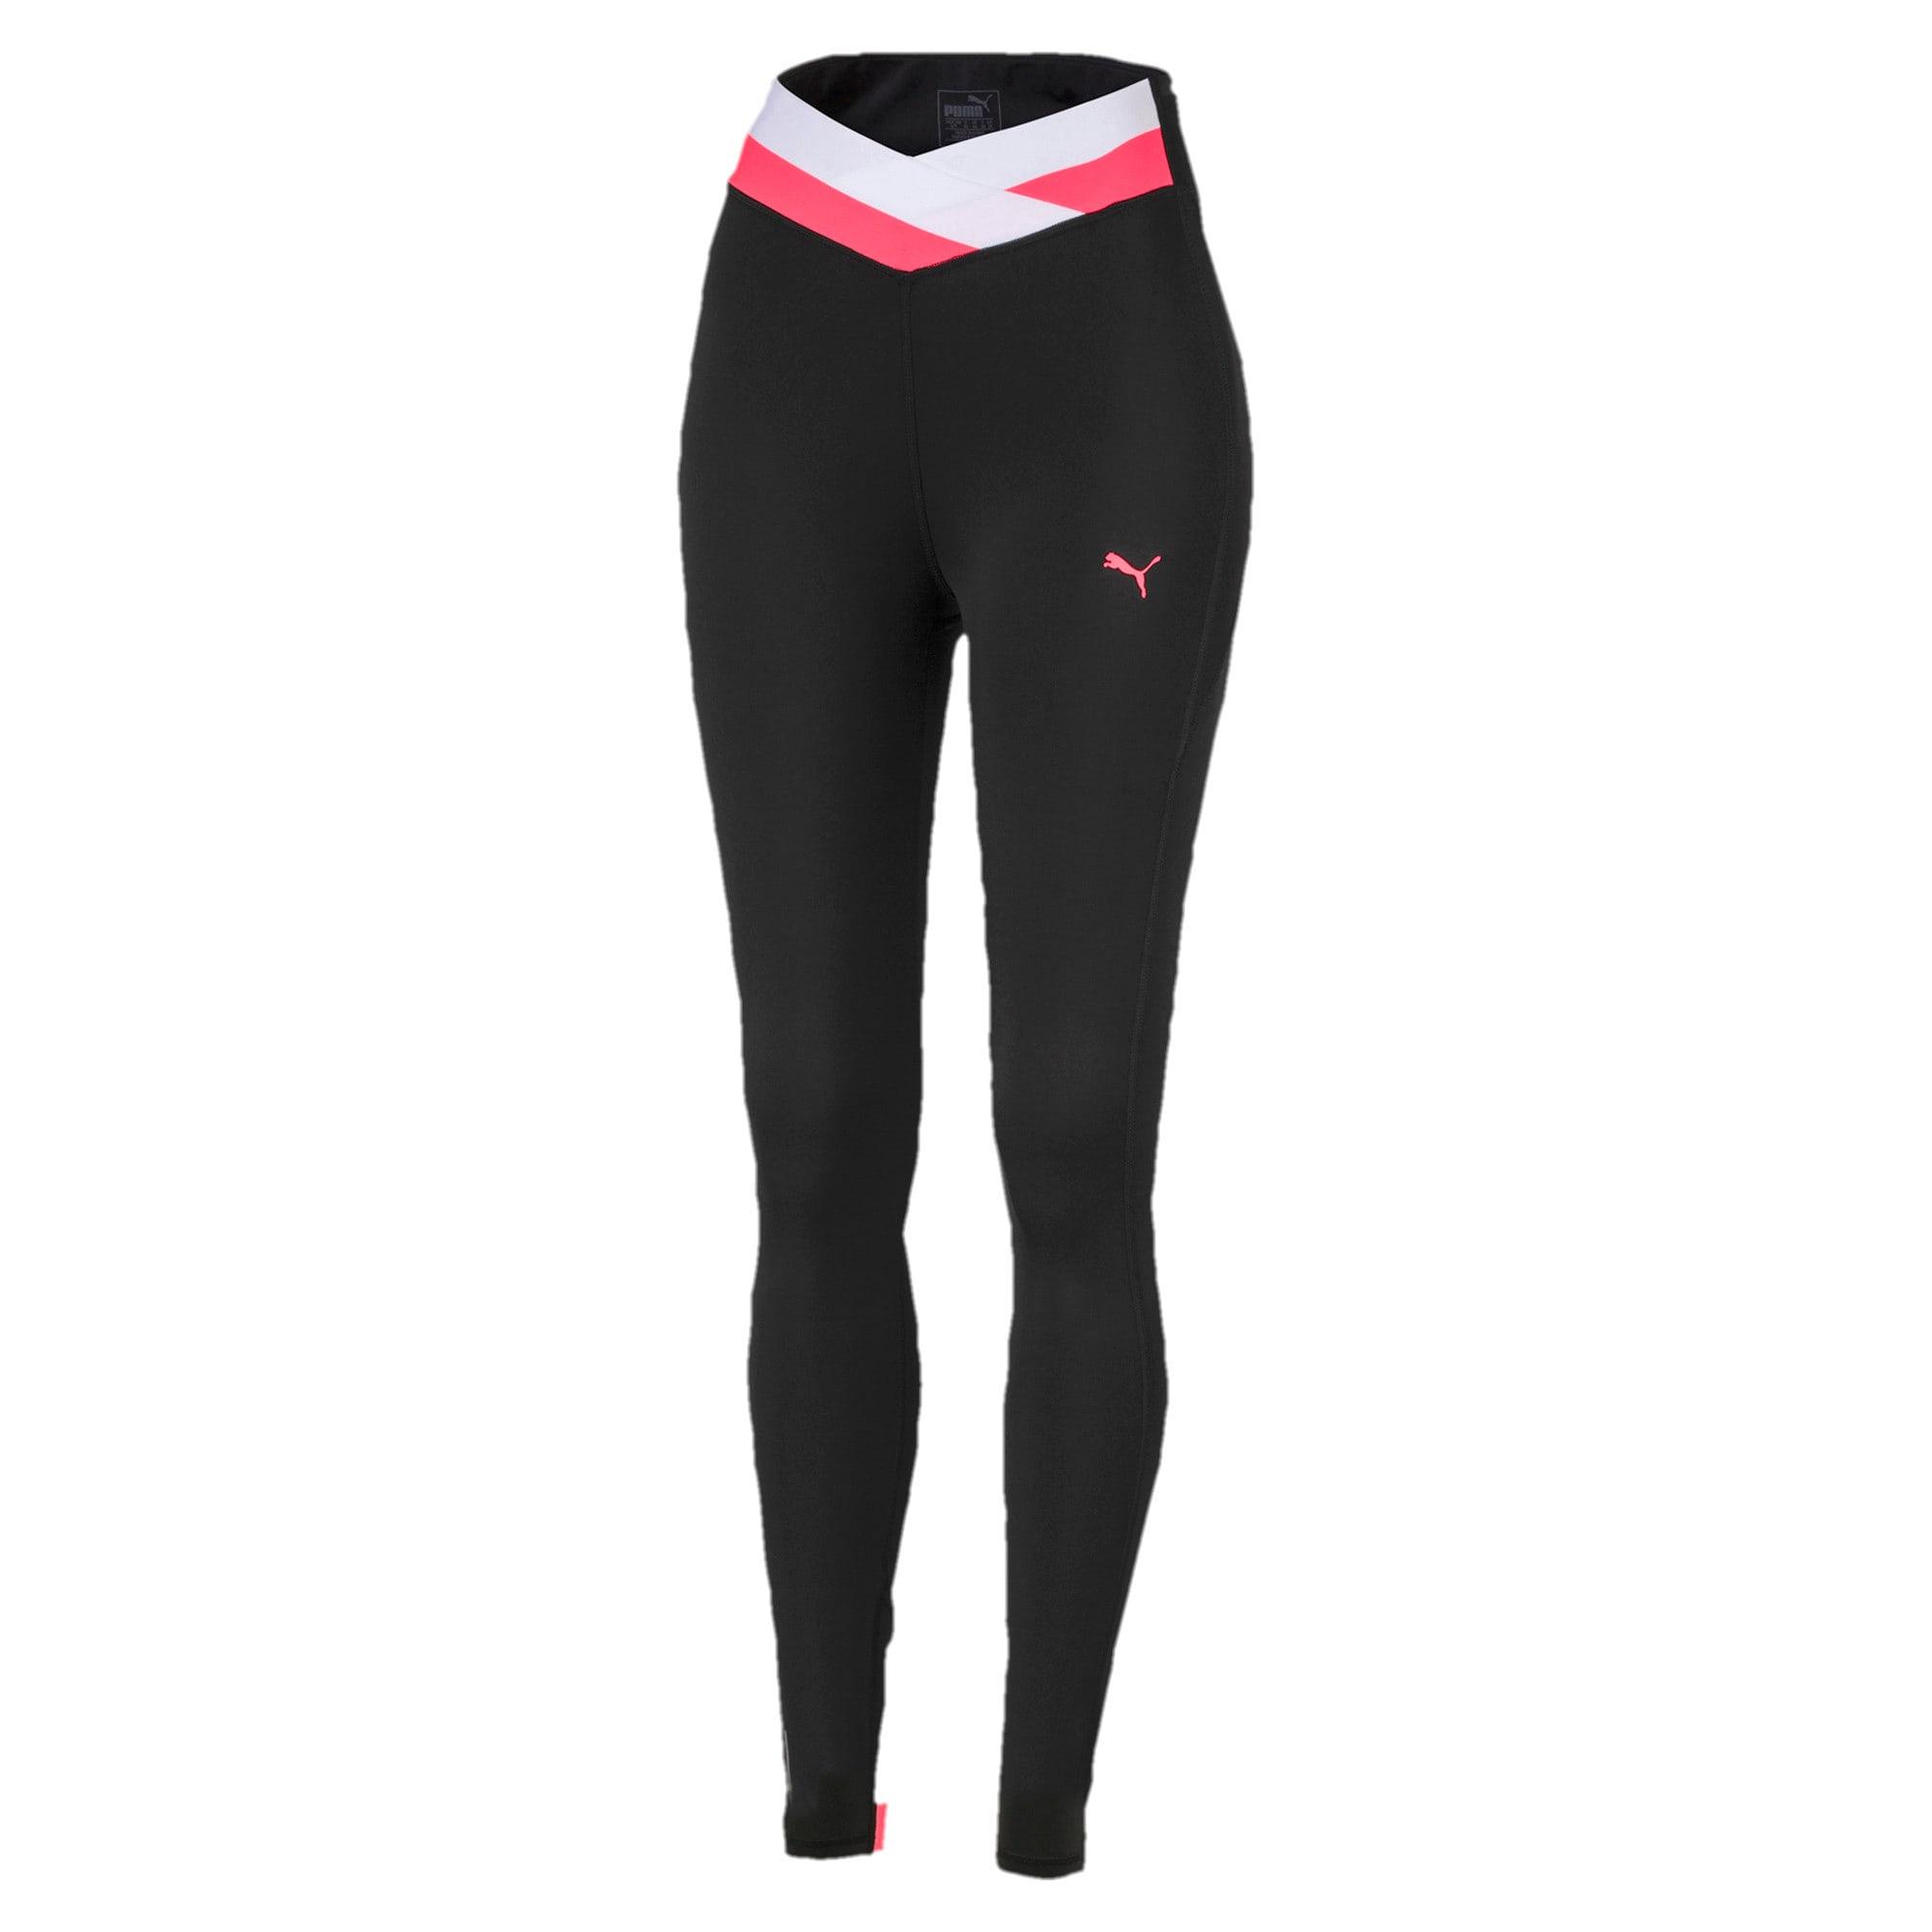 Thumbnail 4 of HIT Feel It 7/8 Women's Training Leggings, Puma Black-Pink Alert, medium